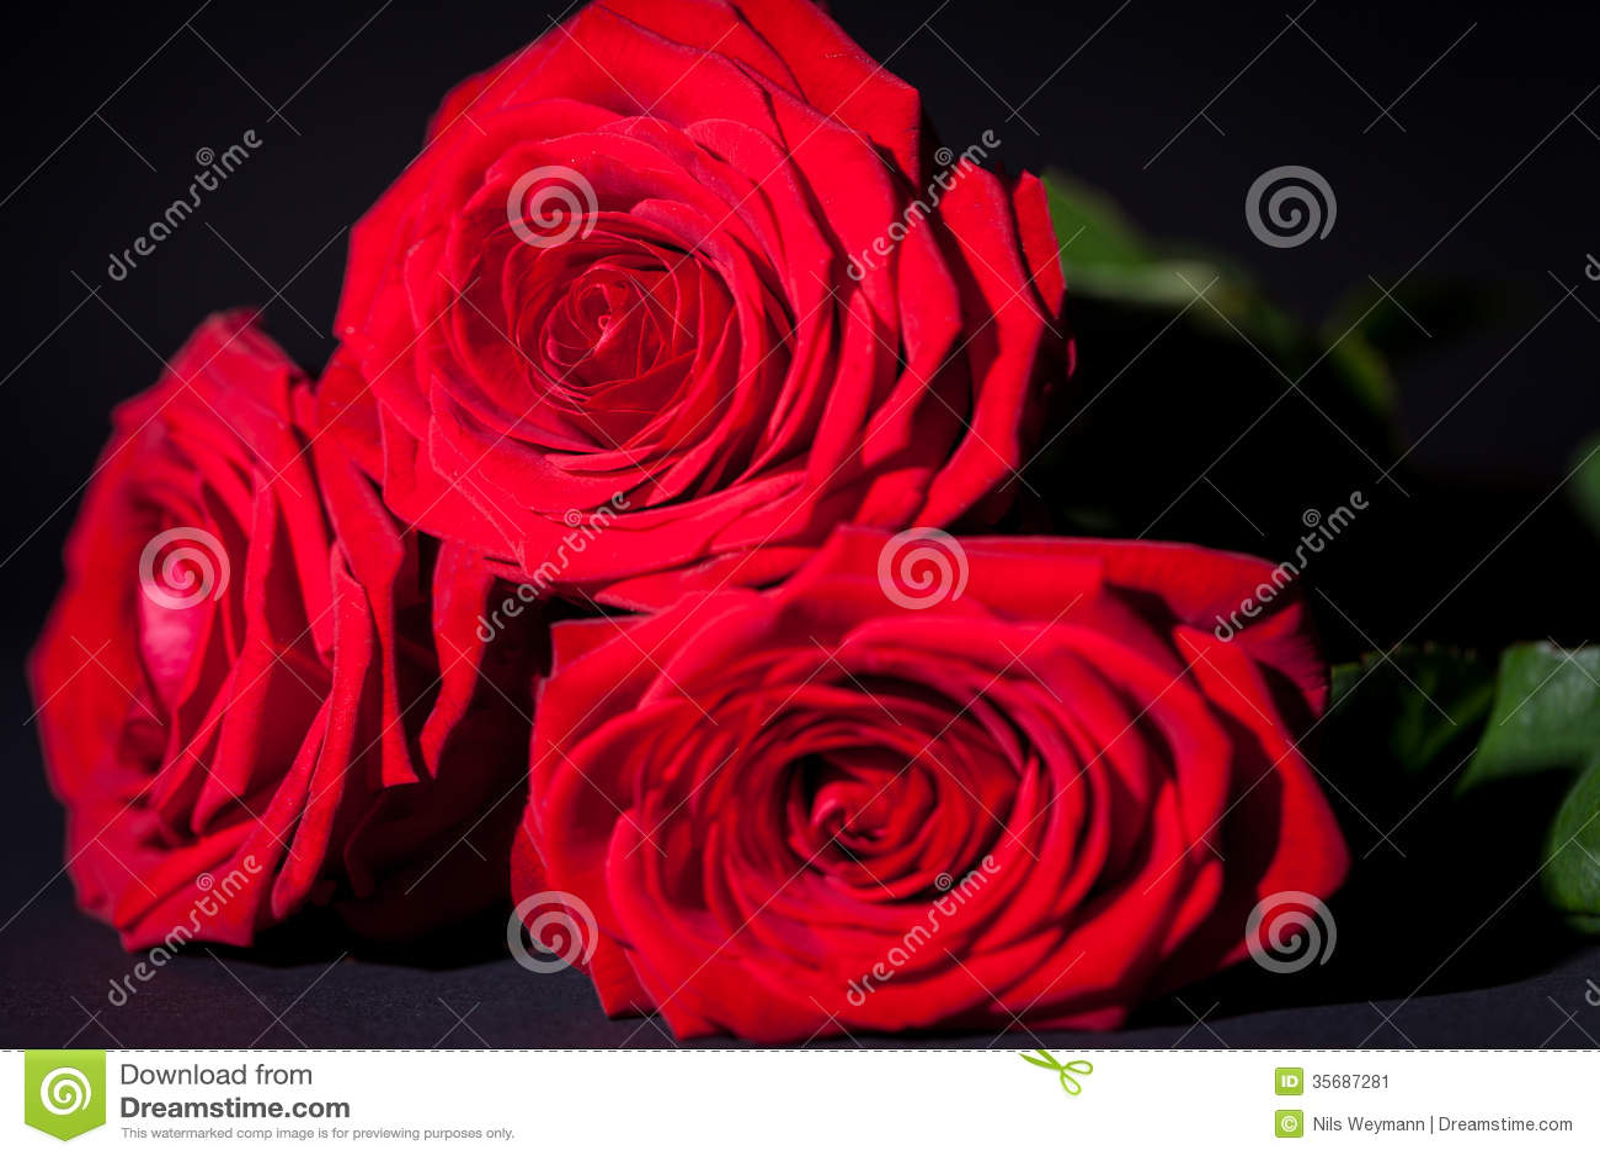 Beautiful red rose flower on black background stock image image of beautiful red rose flower on black background izmirmasajfo